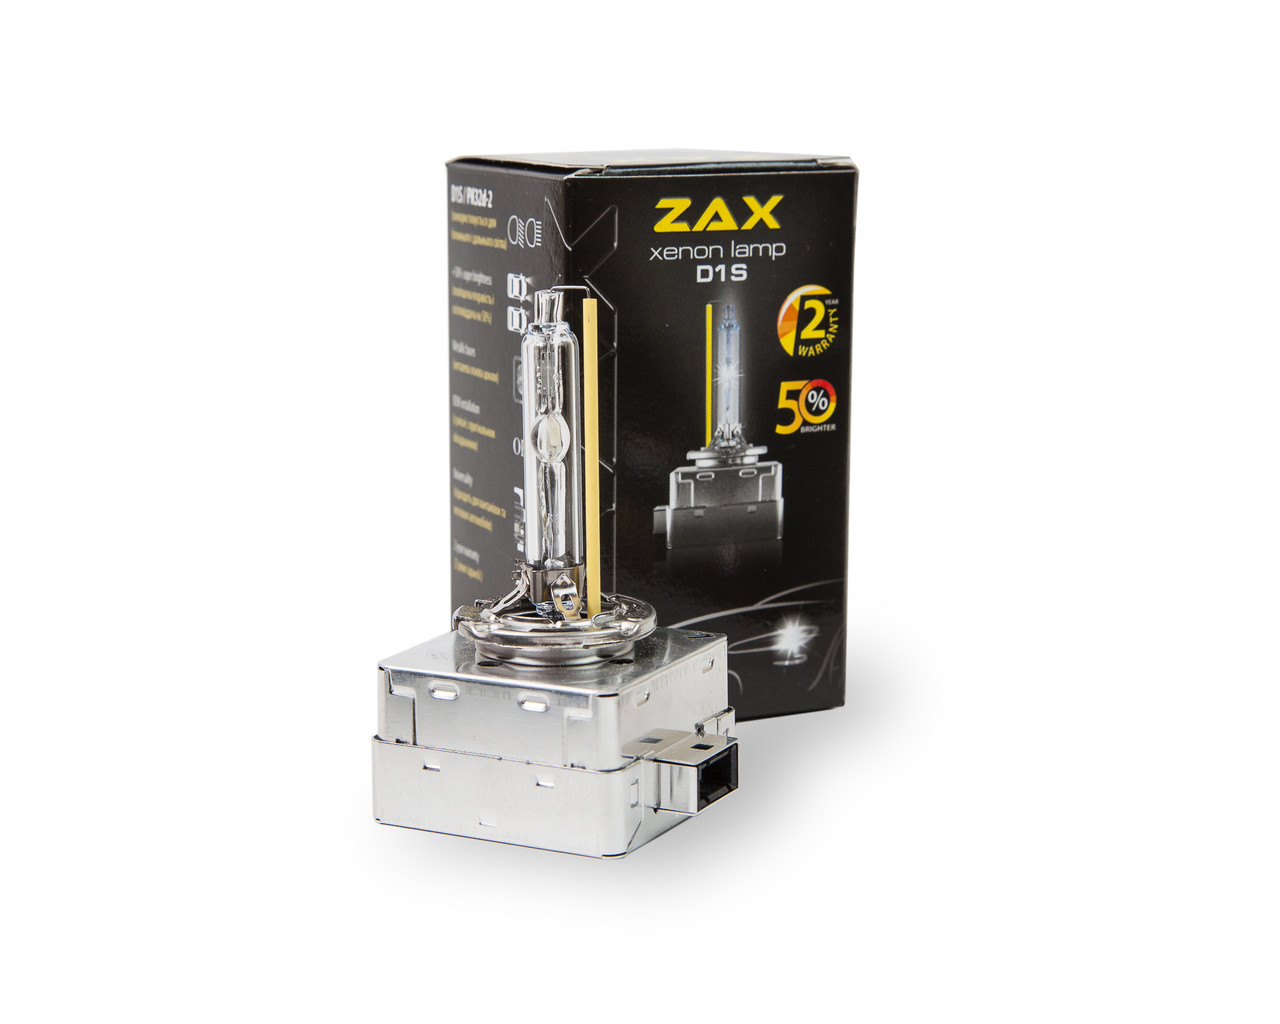 Ксеноновая лампа Zax metal base D1S +50% 6000K (hub_jPPV79593)